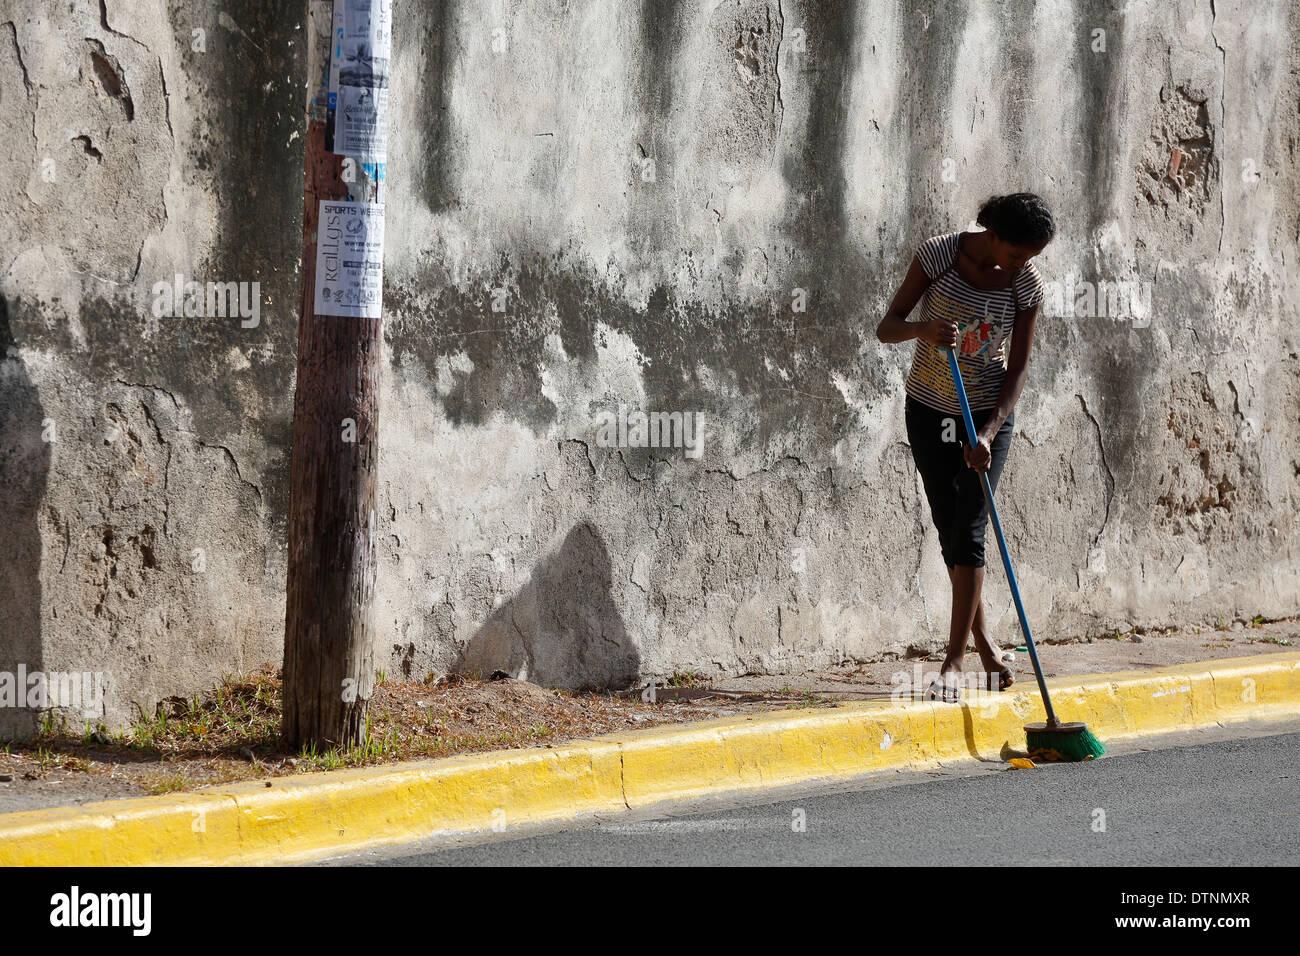 woman sweeping the street, Granada, Nicaragua - Stock Image